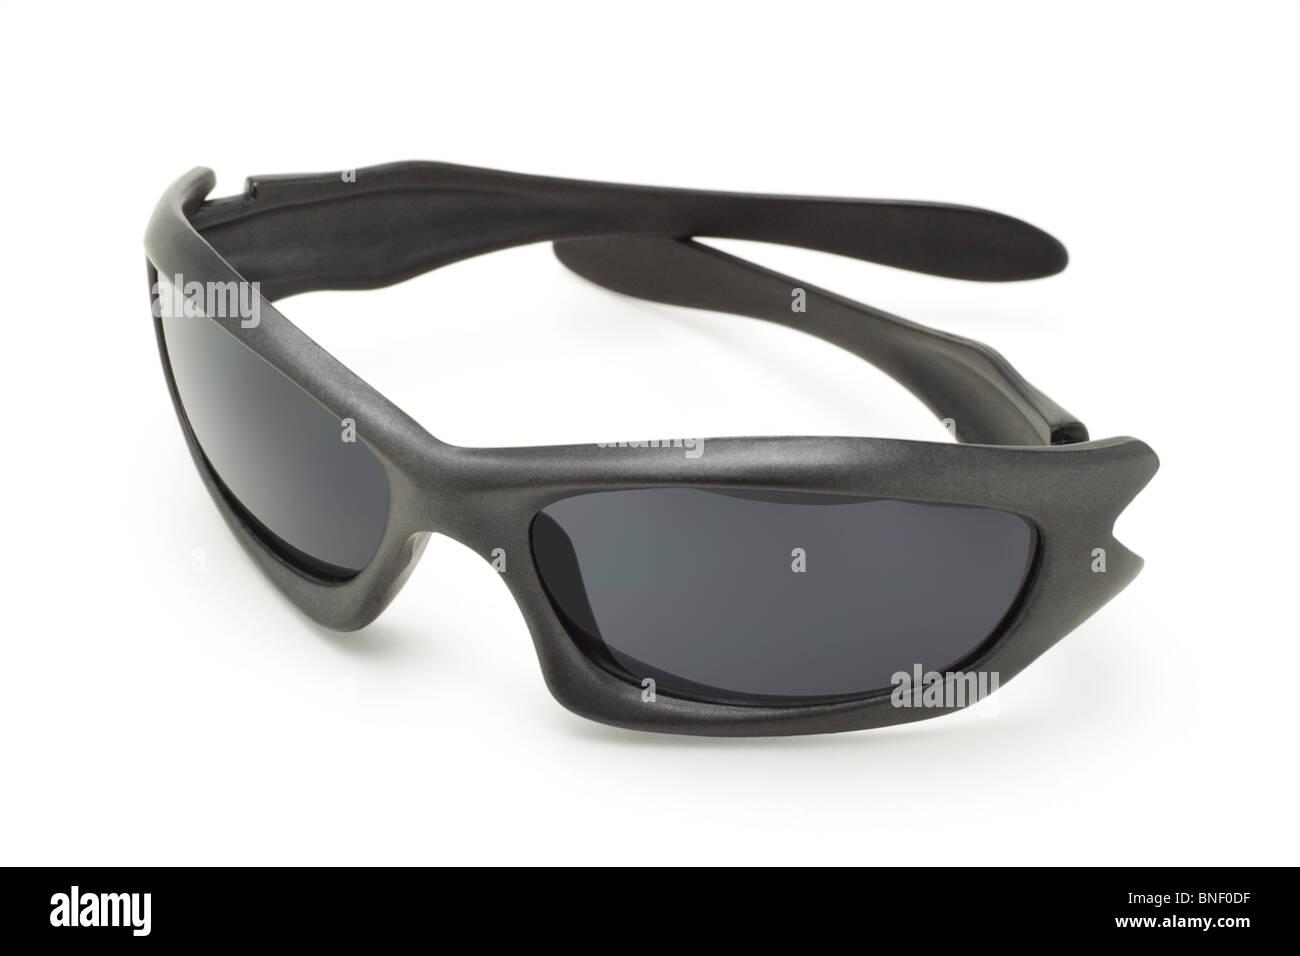 12f8b4cfed3 Protective Sunglasses Stock Photos   Protective Sunglasses Stock ...